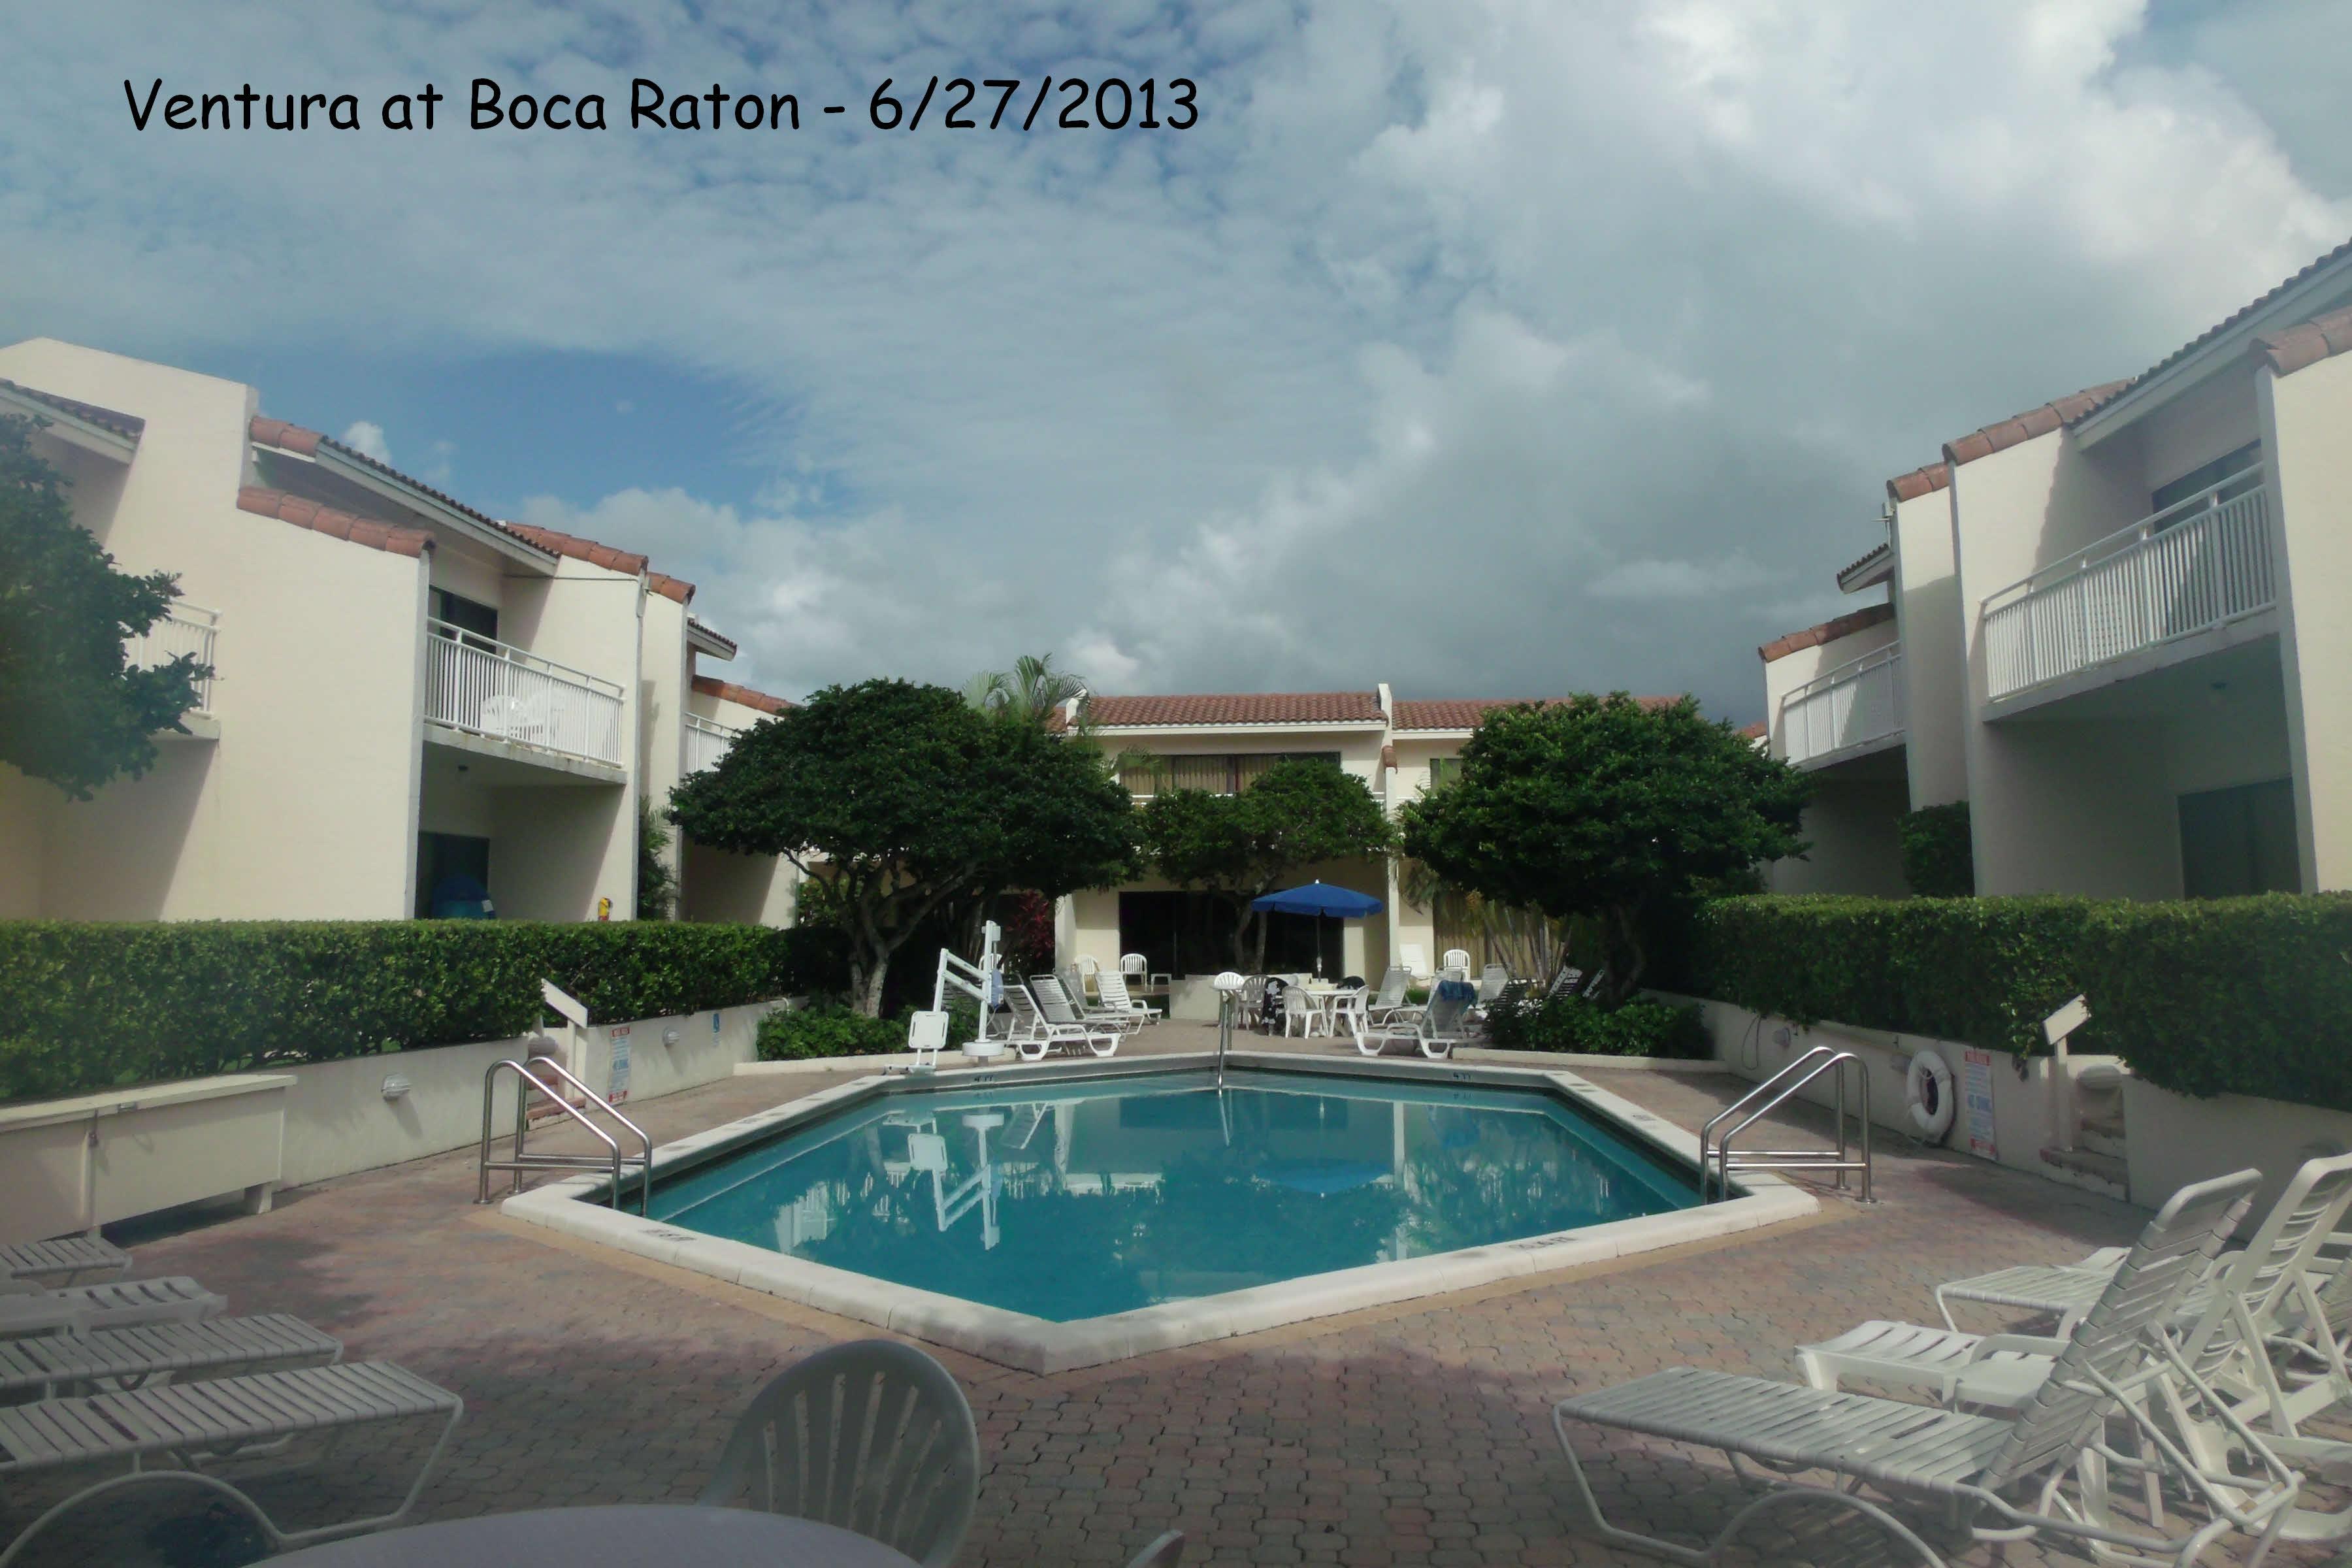 Ventura at Boca Raton image